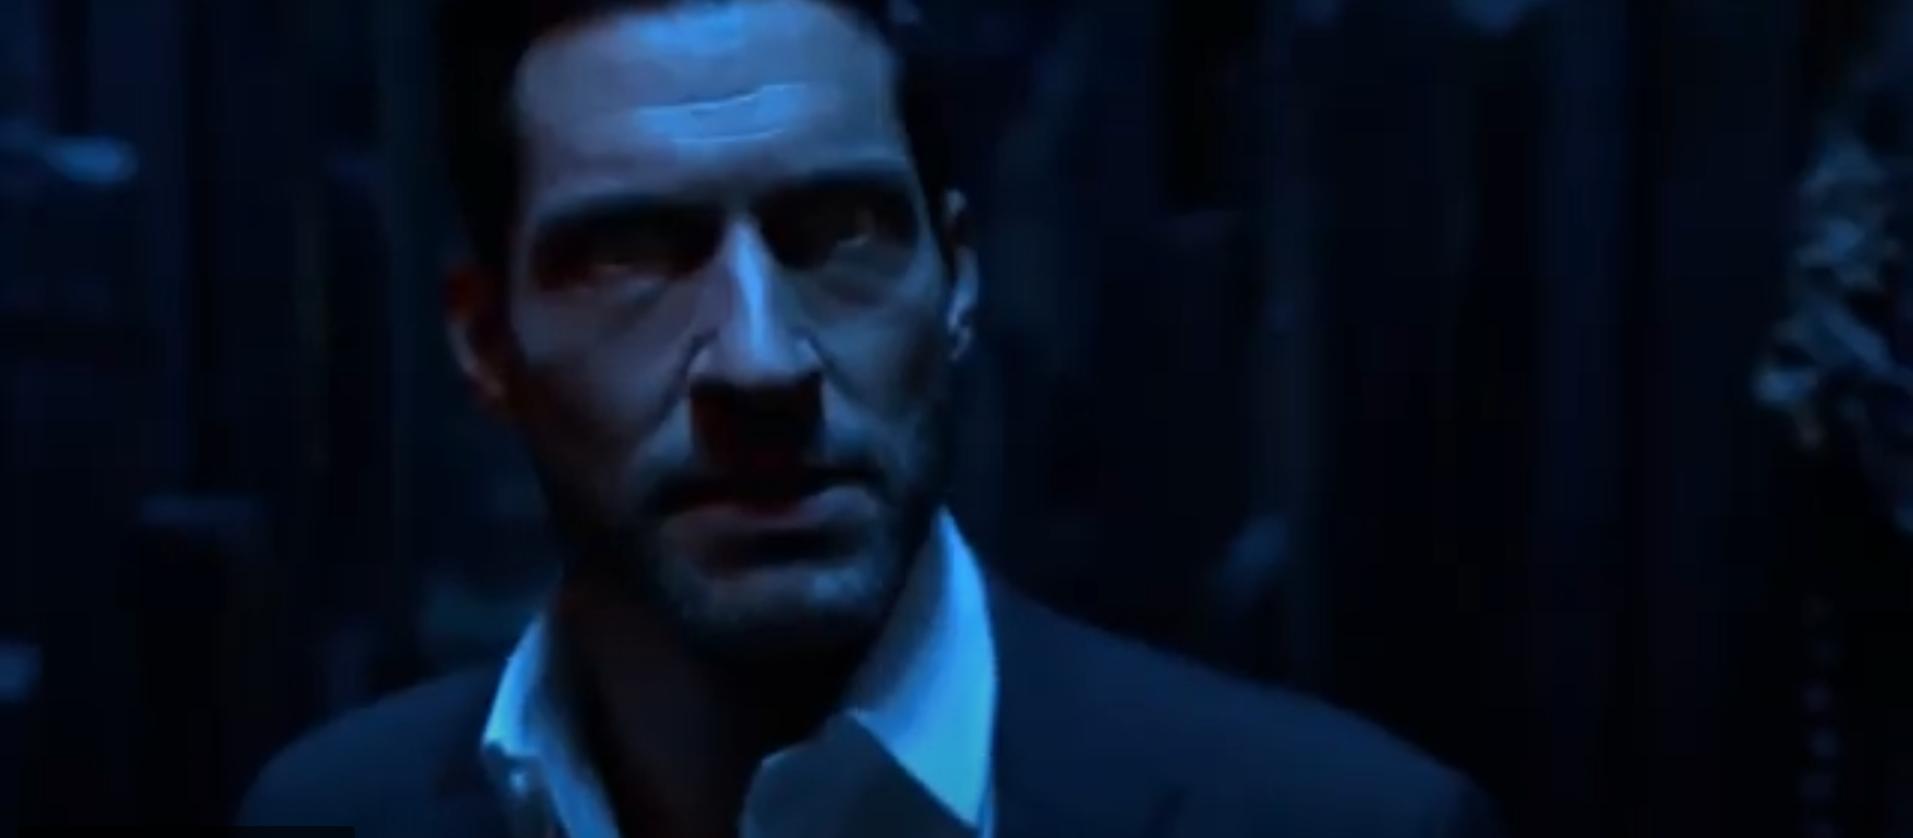 Скриншот из сериала Люцифер 5 сезон Люцифер в Аду